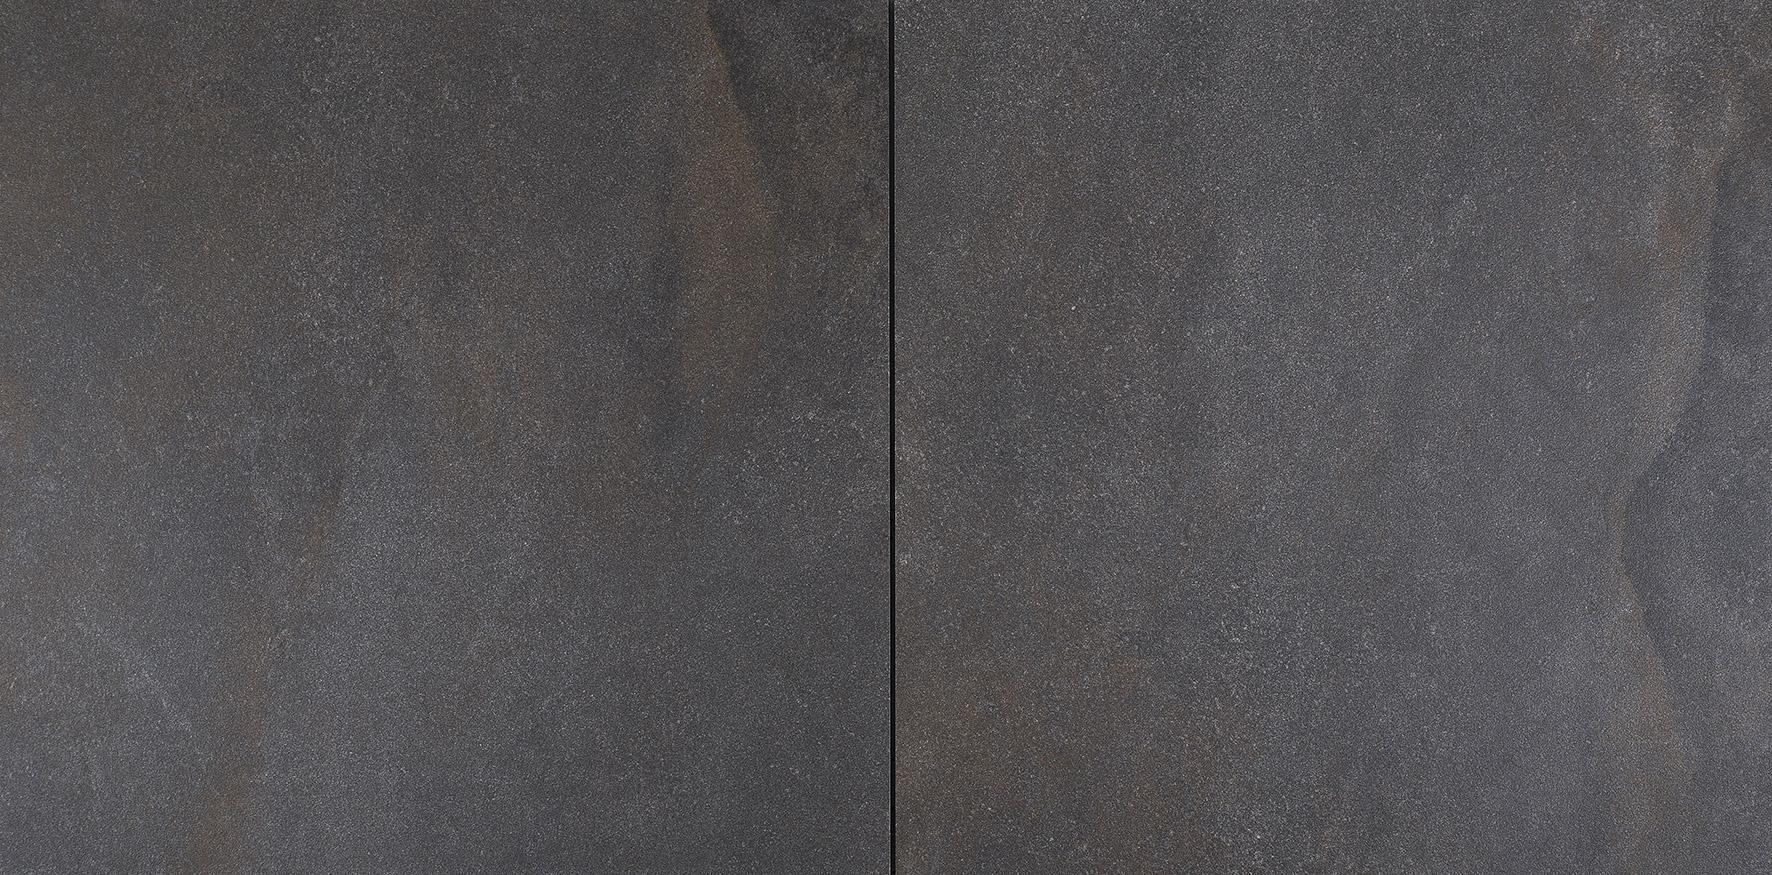 Gardenlux | Cera4line light 60x60x4 | Flamed Black/Brown